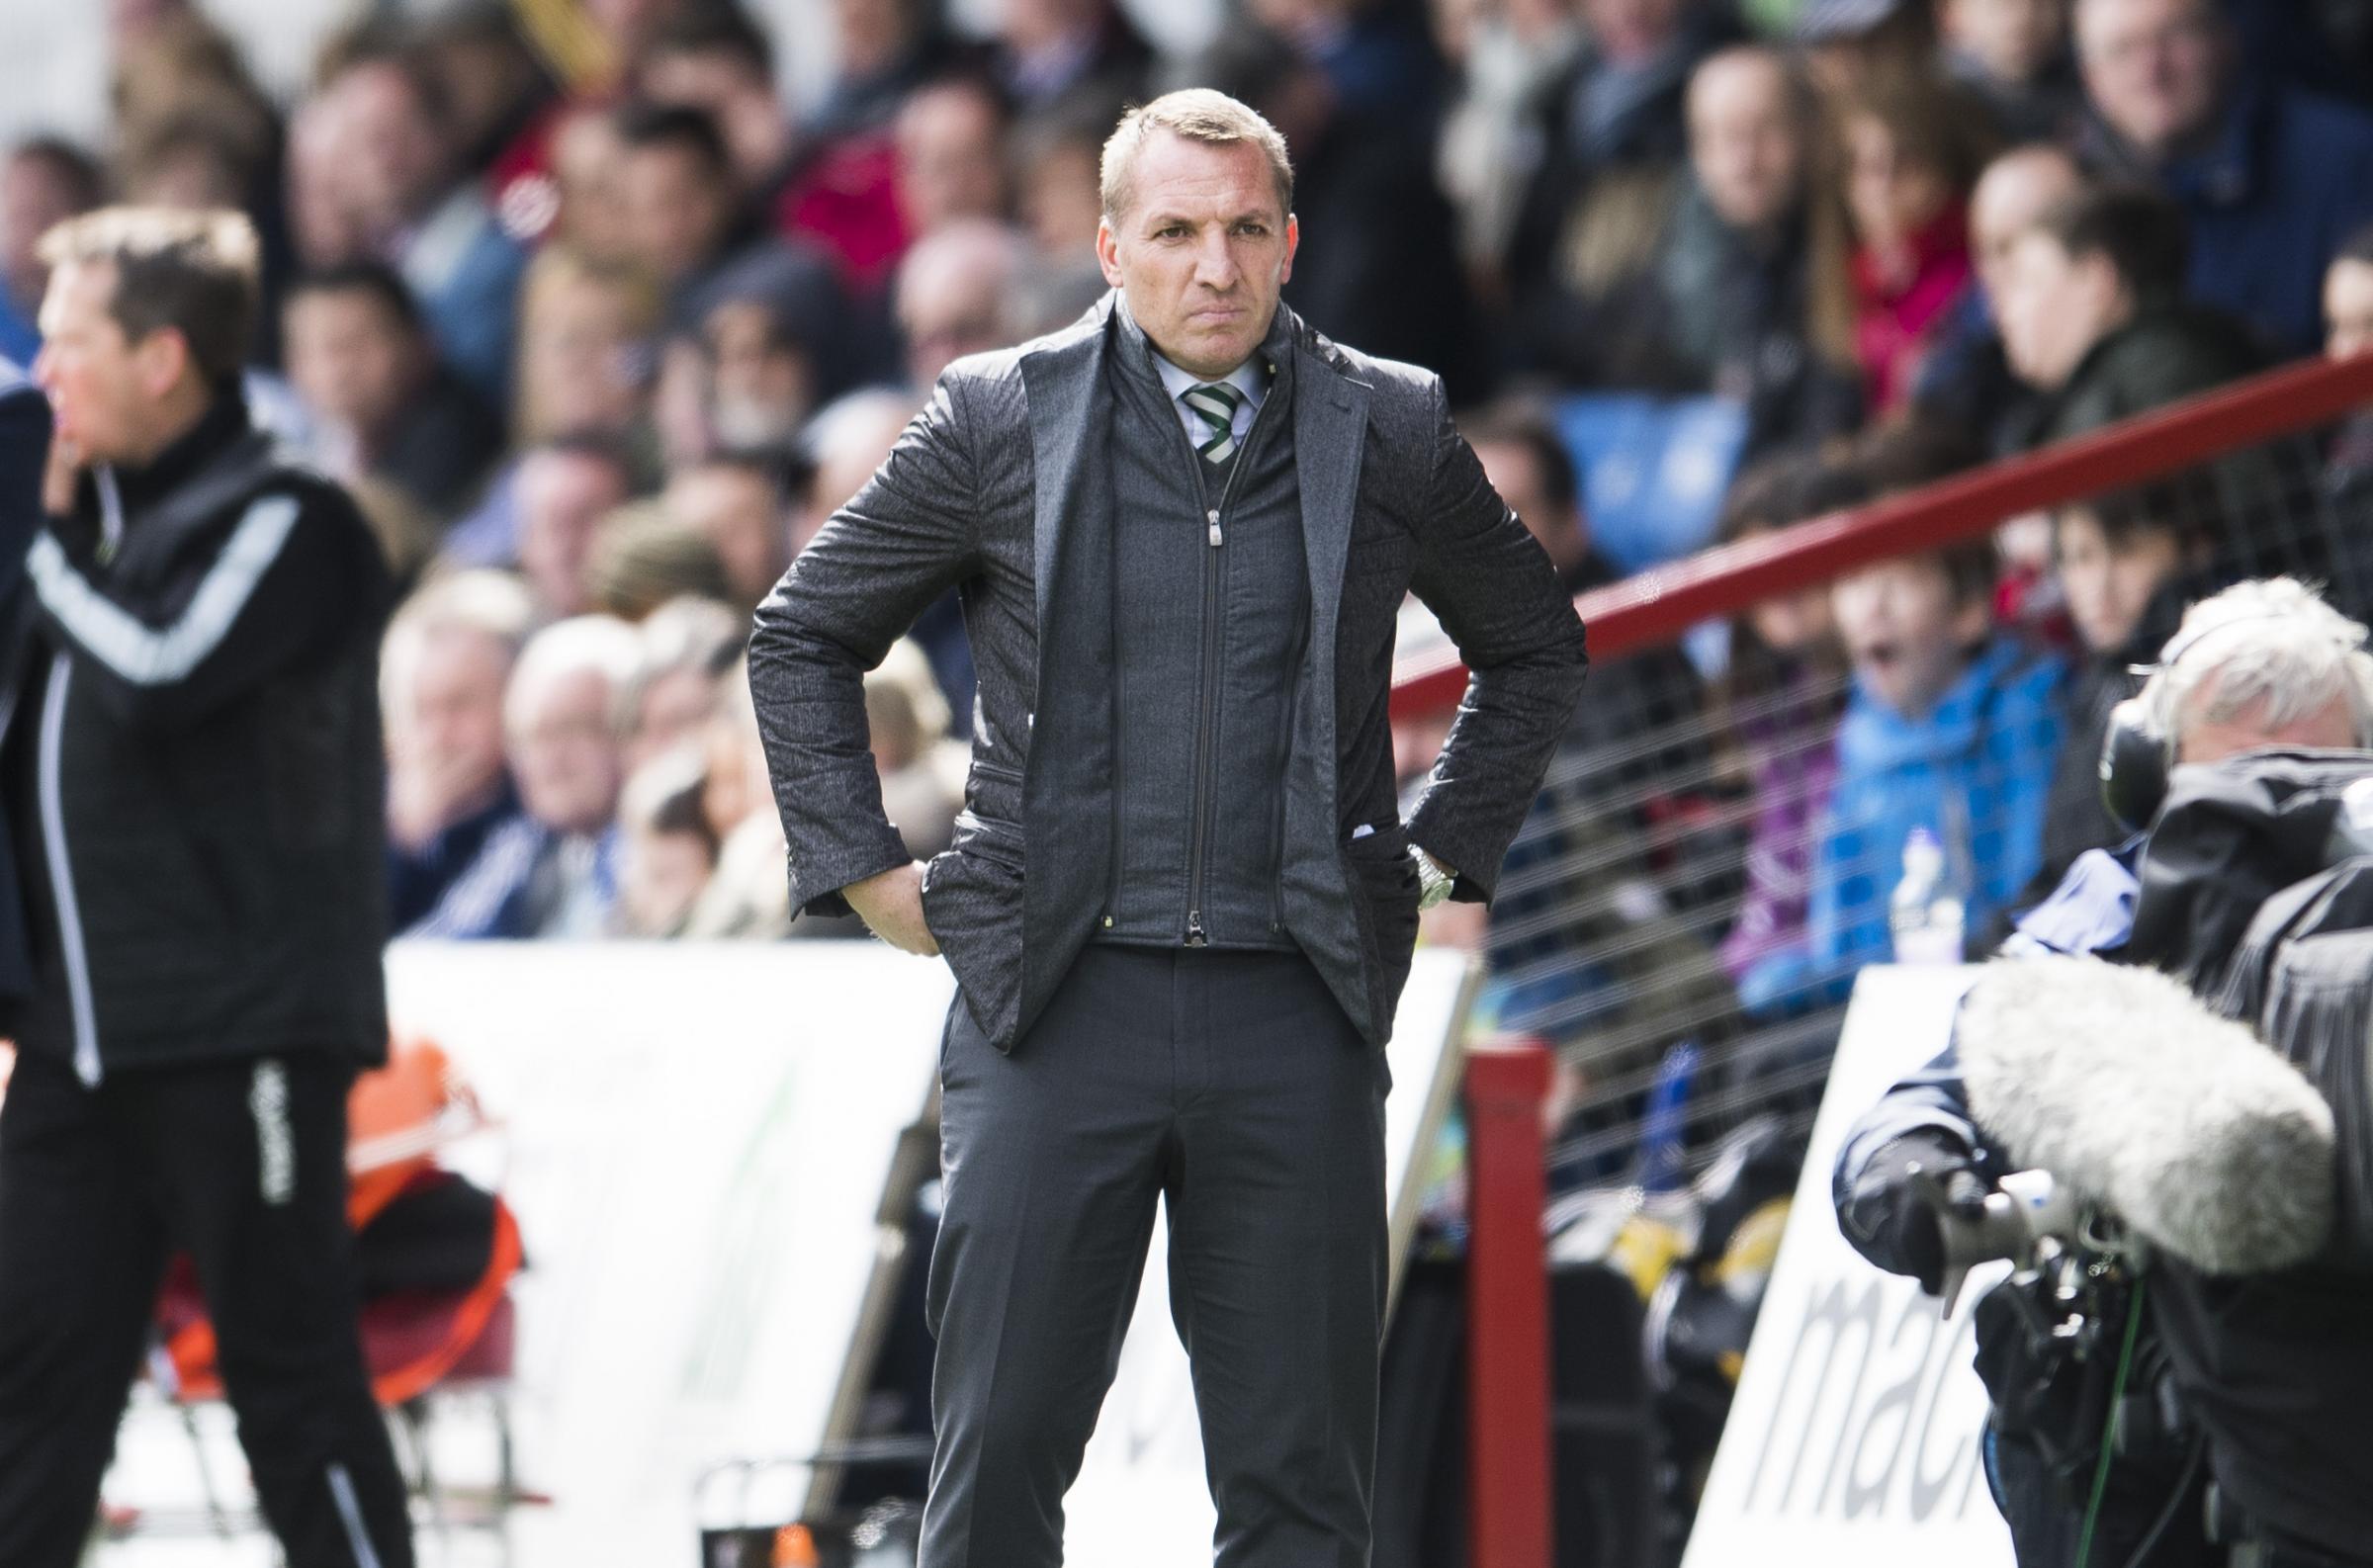 Celtic boss Brendan Rodgers tells referee Don Robertson he owes Erik Sviatchenko an apology